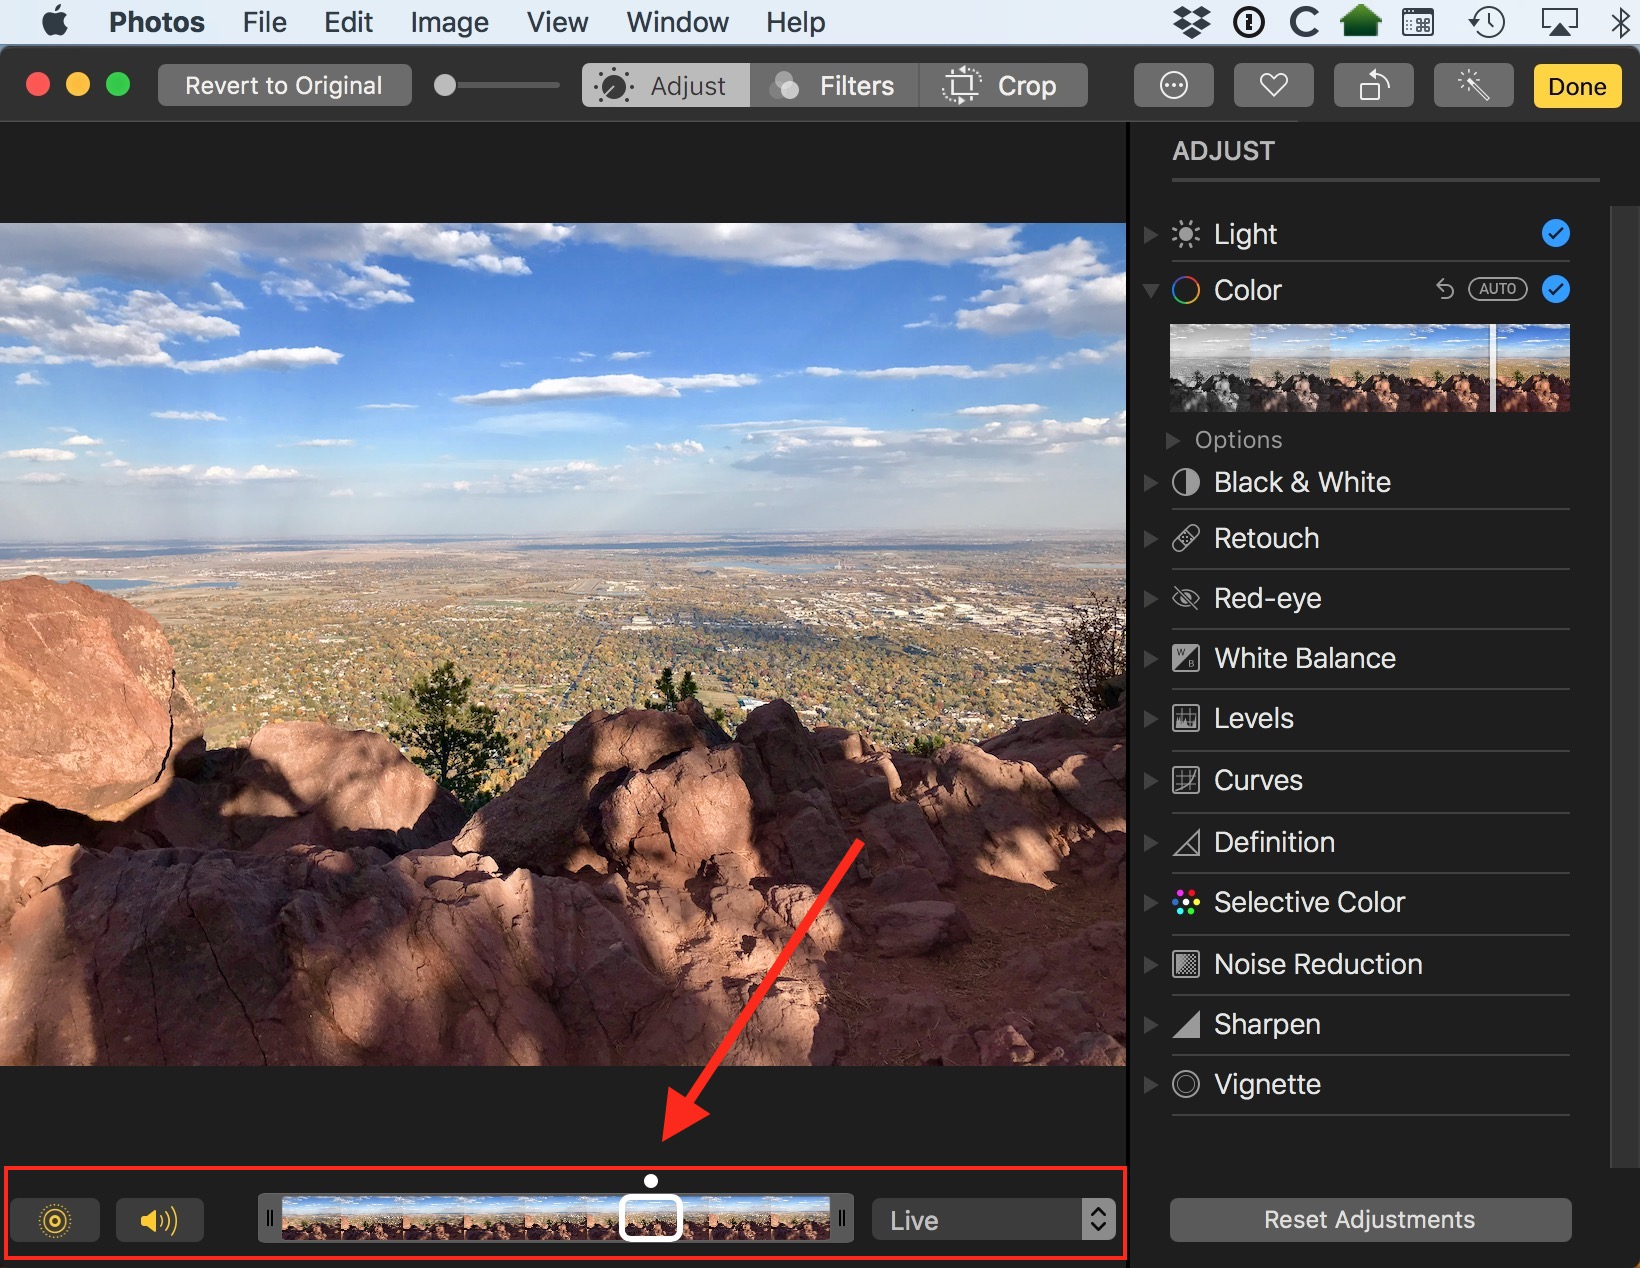 macOS High Sierra Live Photos Editing Tools in Photos app